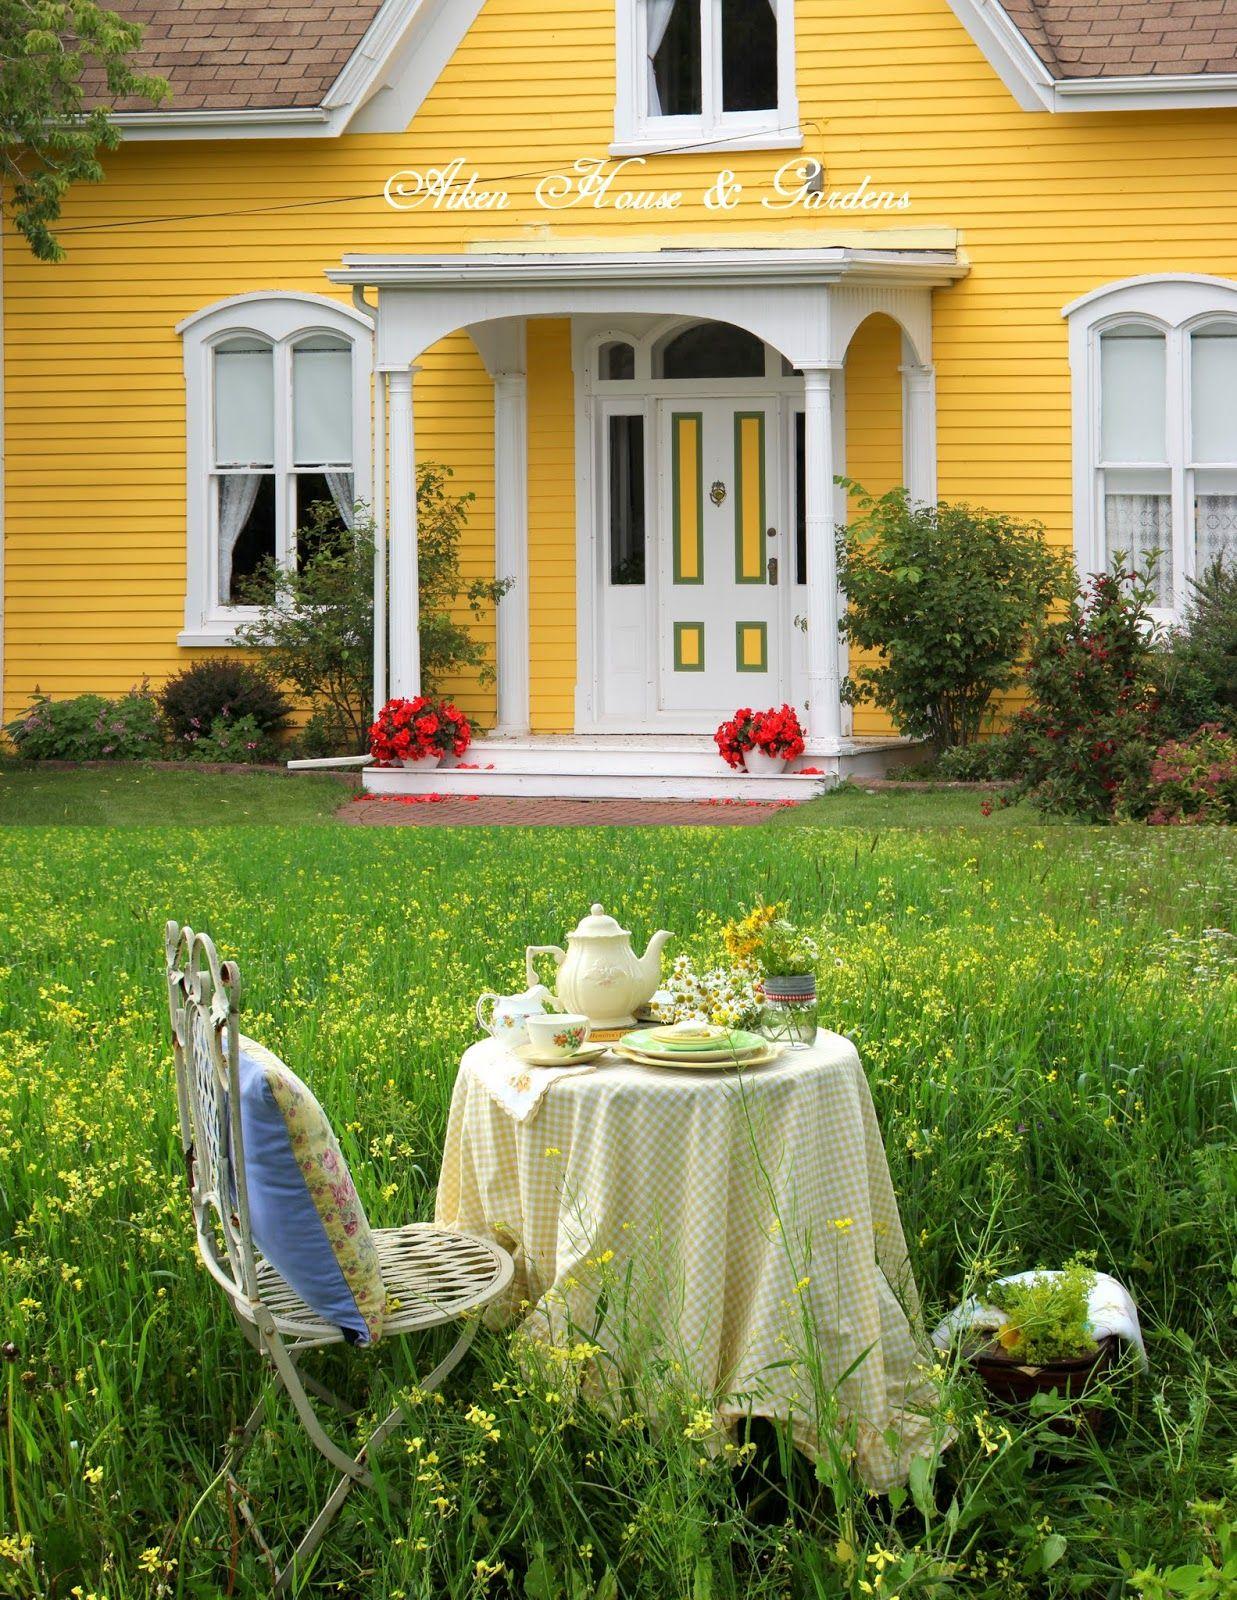 Aiken House & Gardens Sunshine Yellows